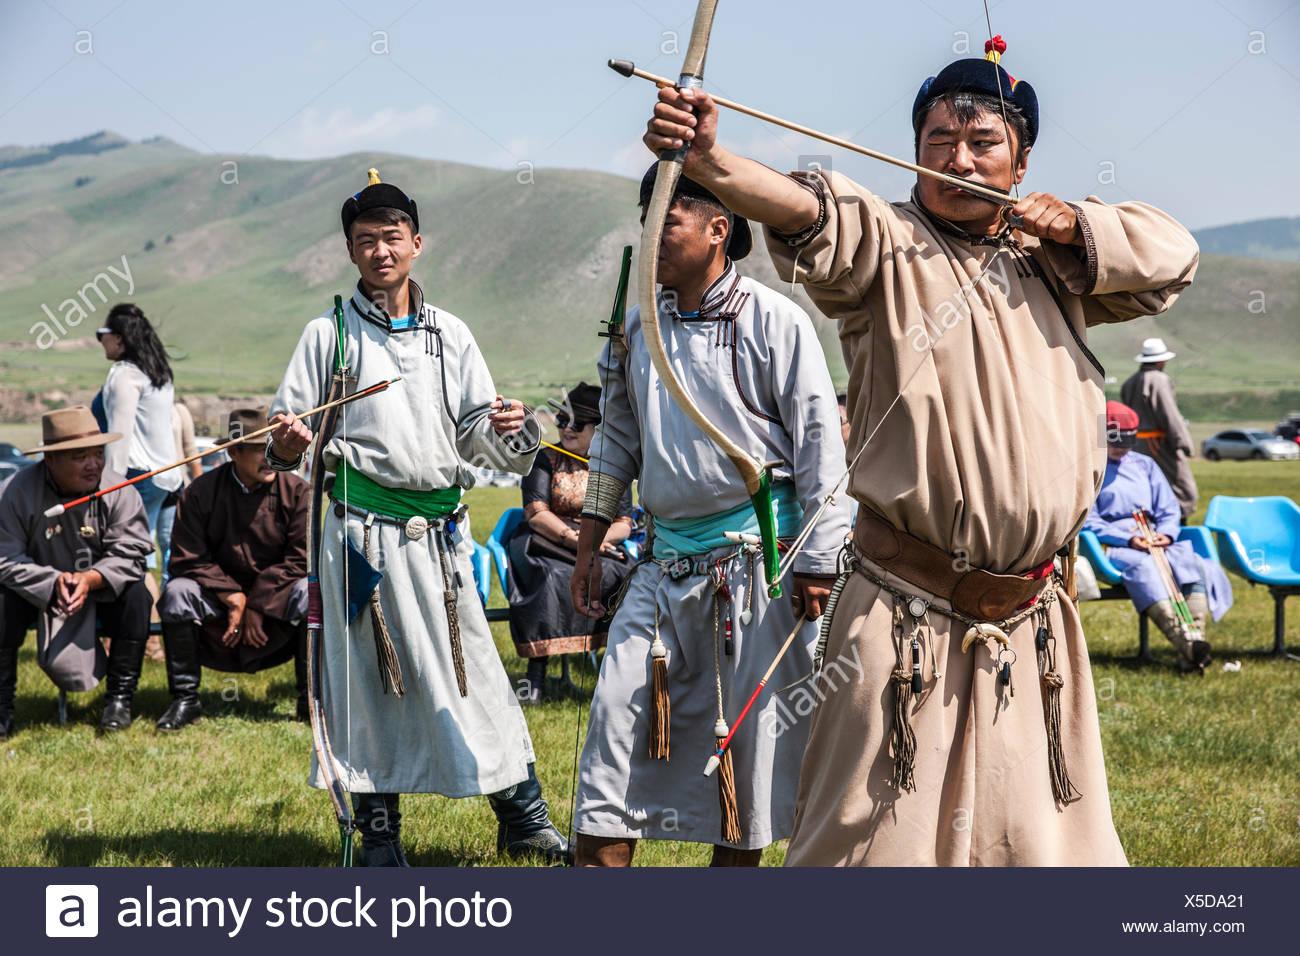 mongolian-archery-at-naadam-festival-bul